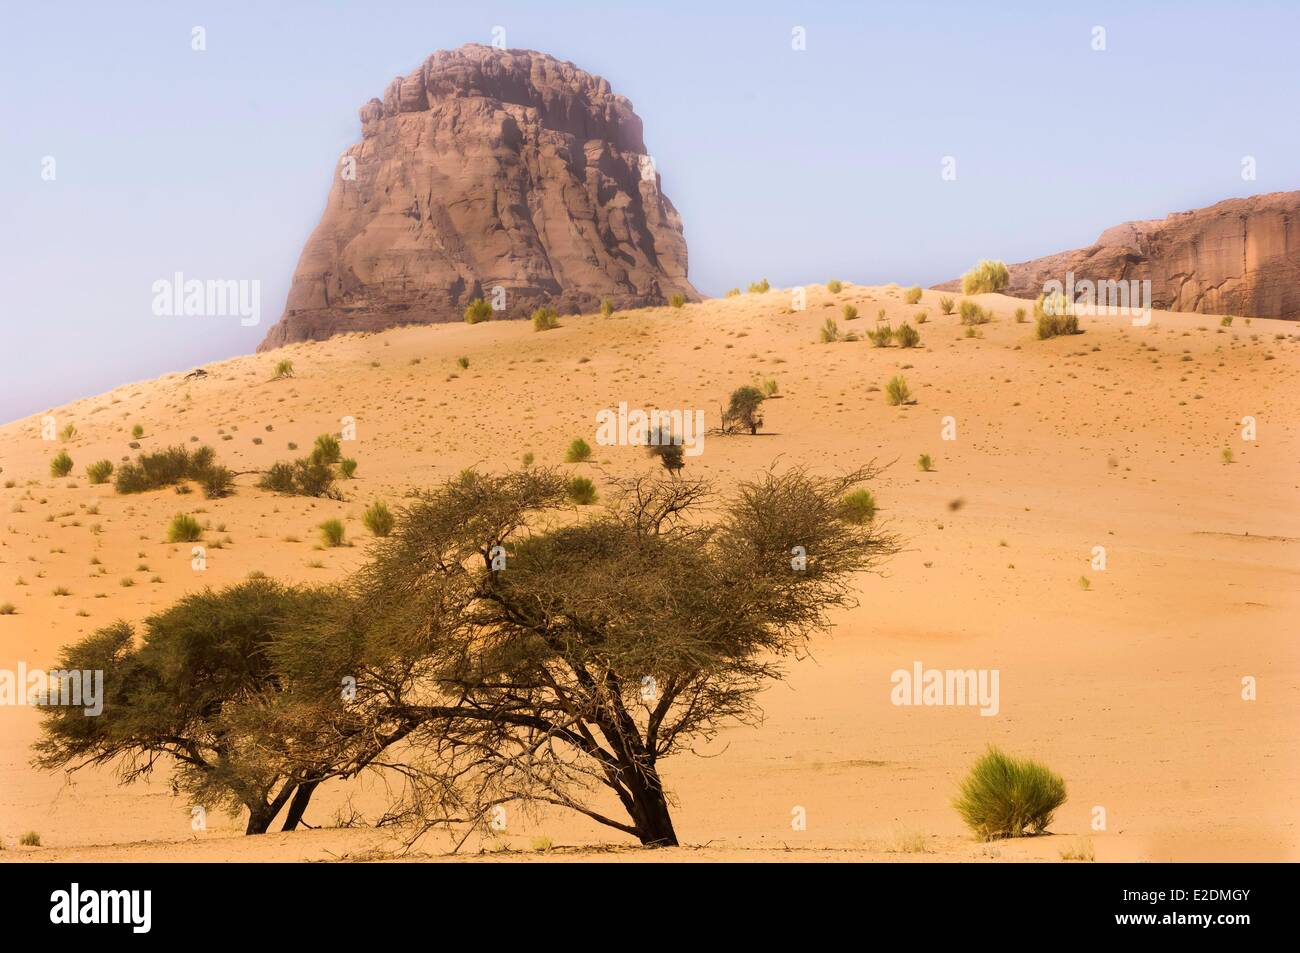 Chad Southern Sahara desert Ennedi massif Birdjigol well - Stock Image